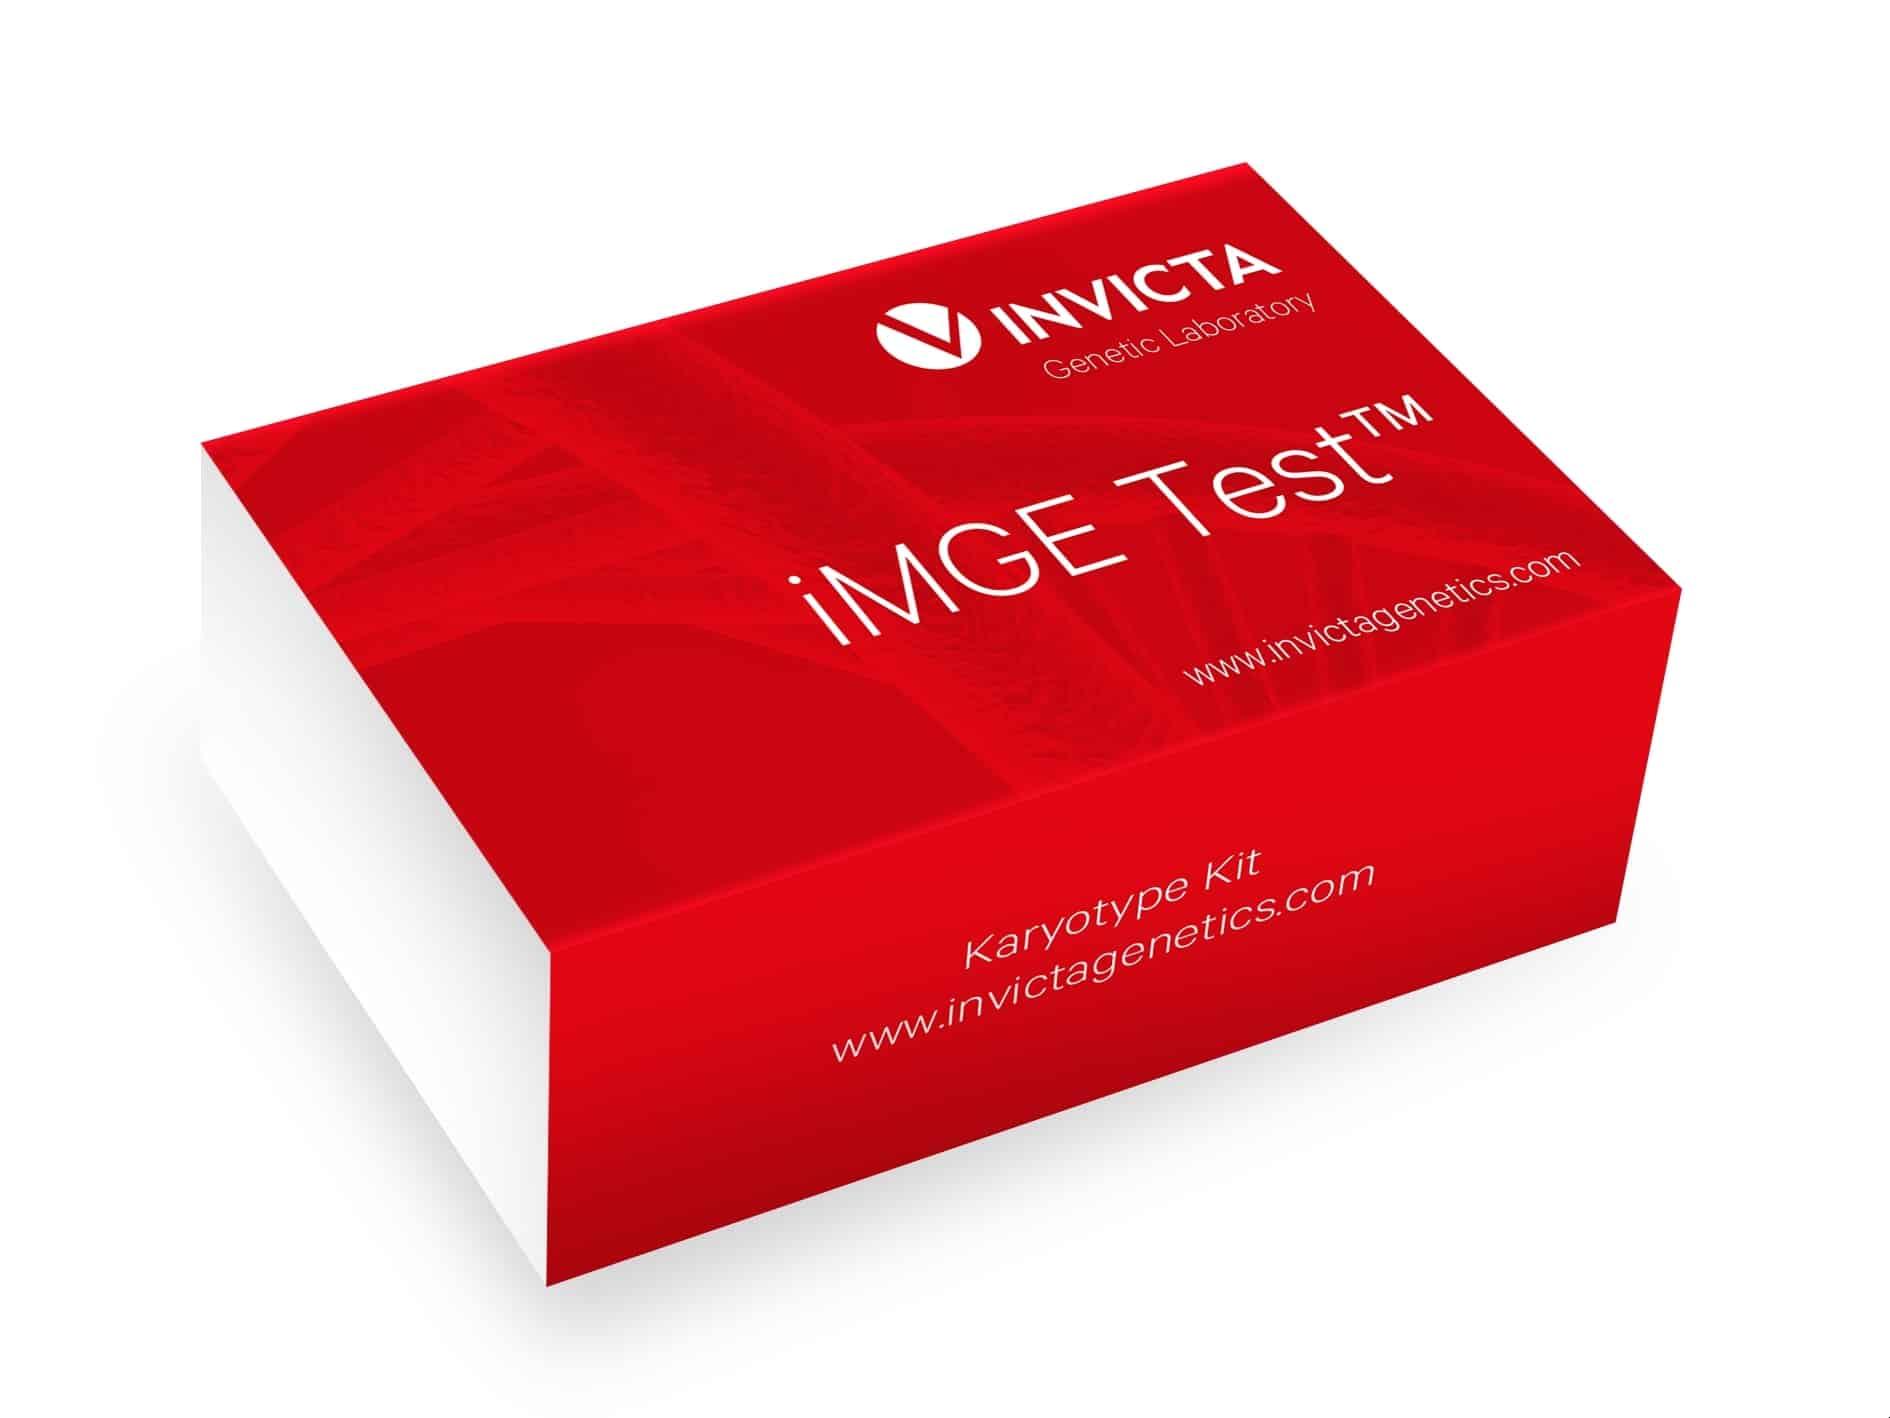 <h5>Zestaw iMGE Test</h5>